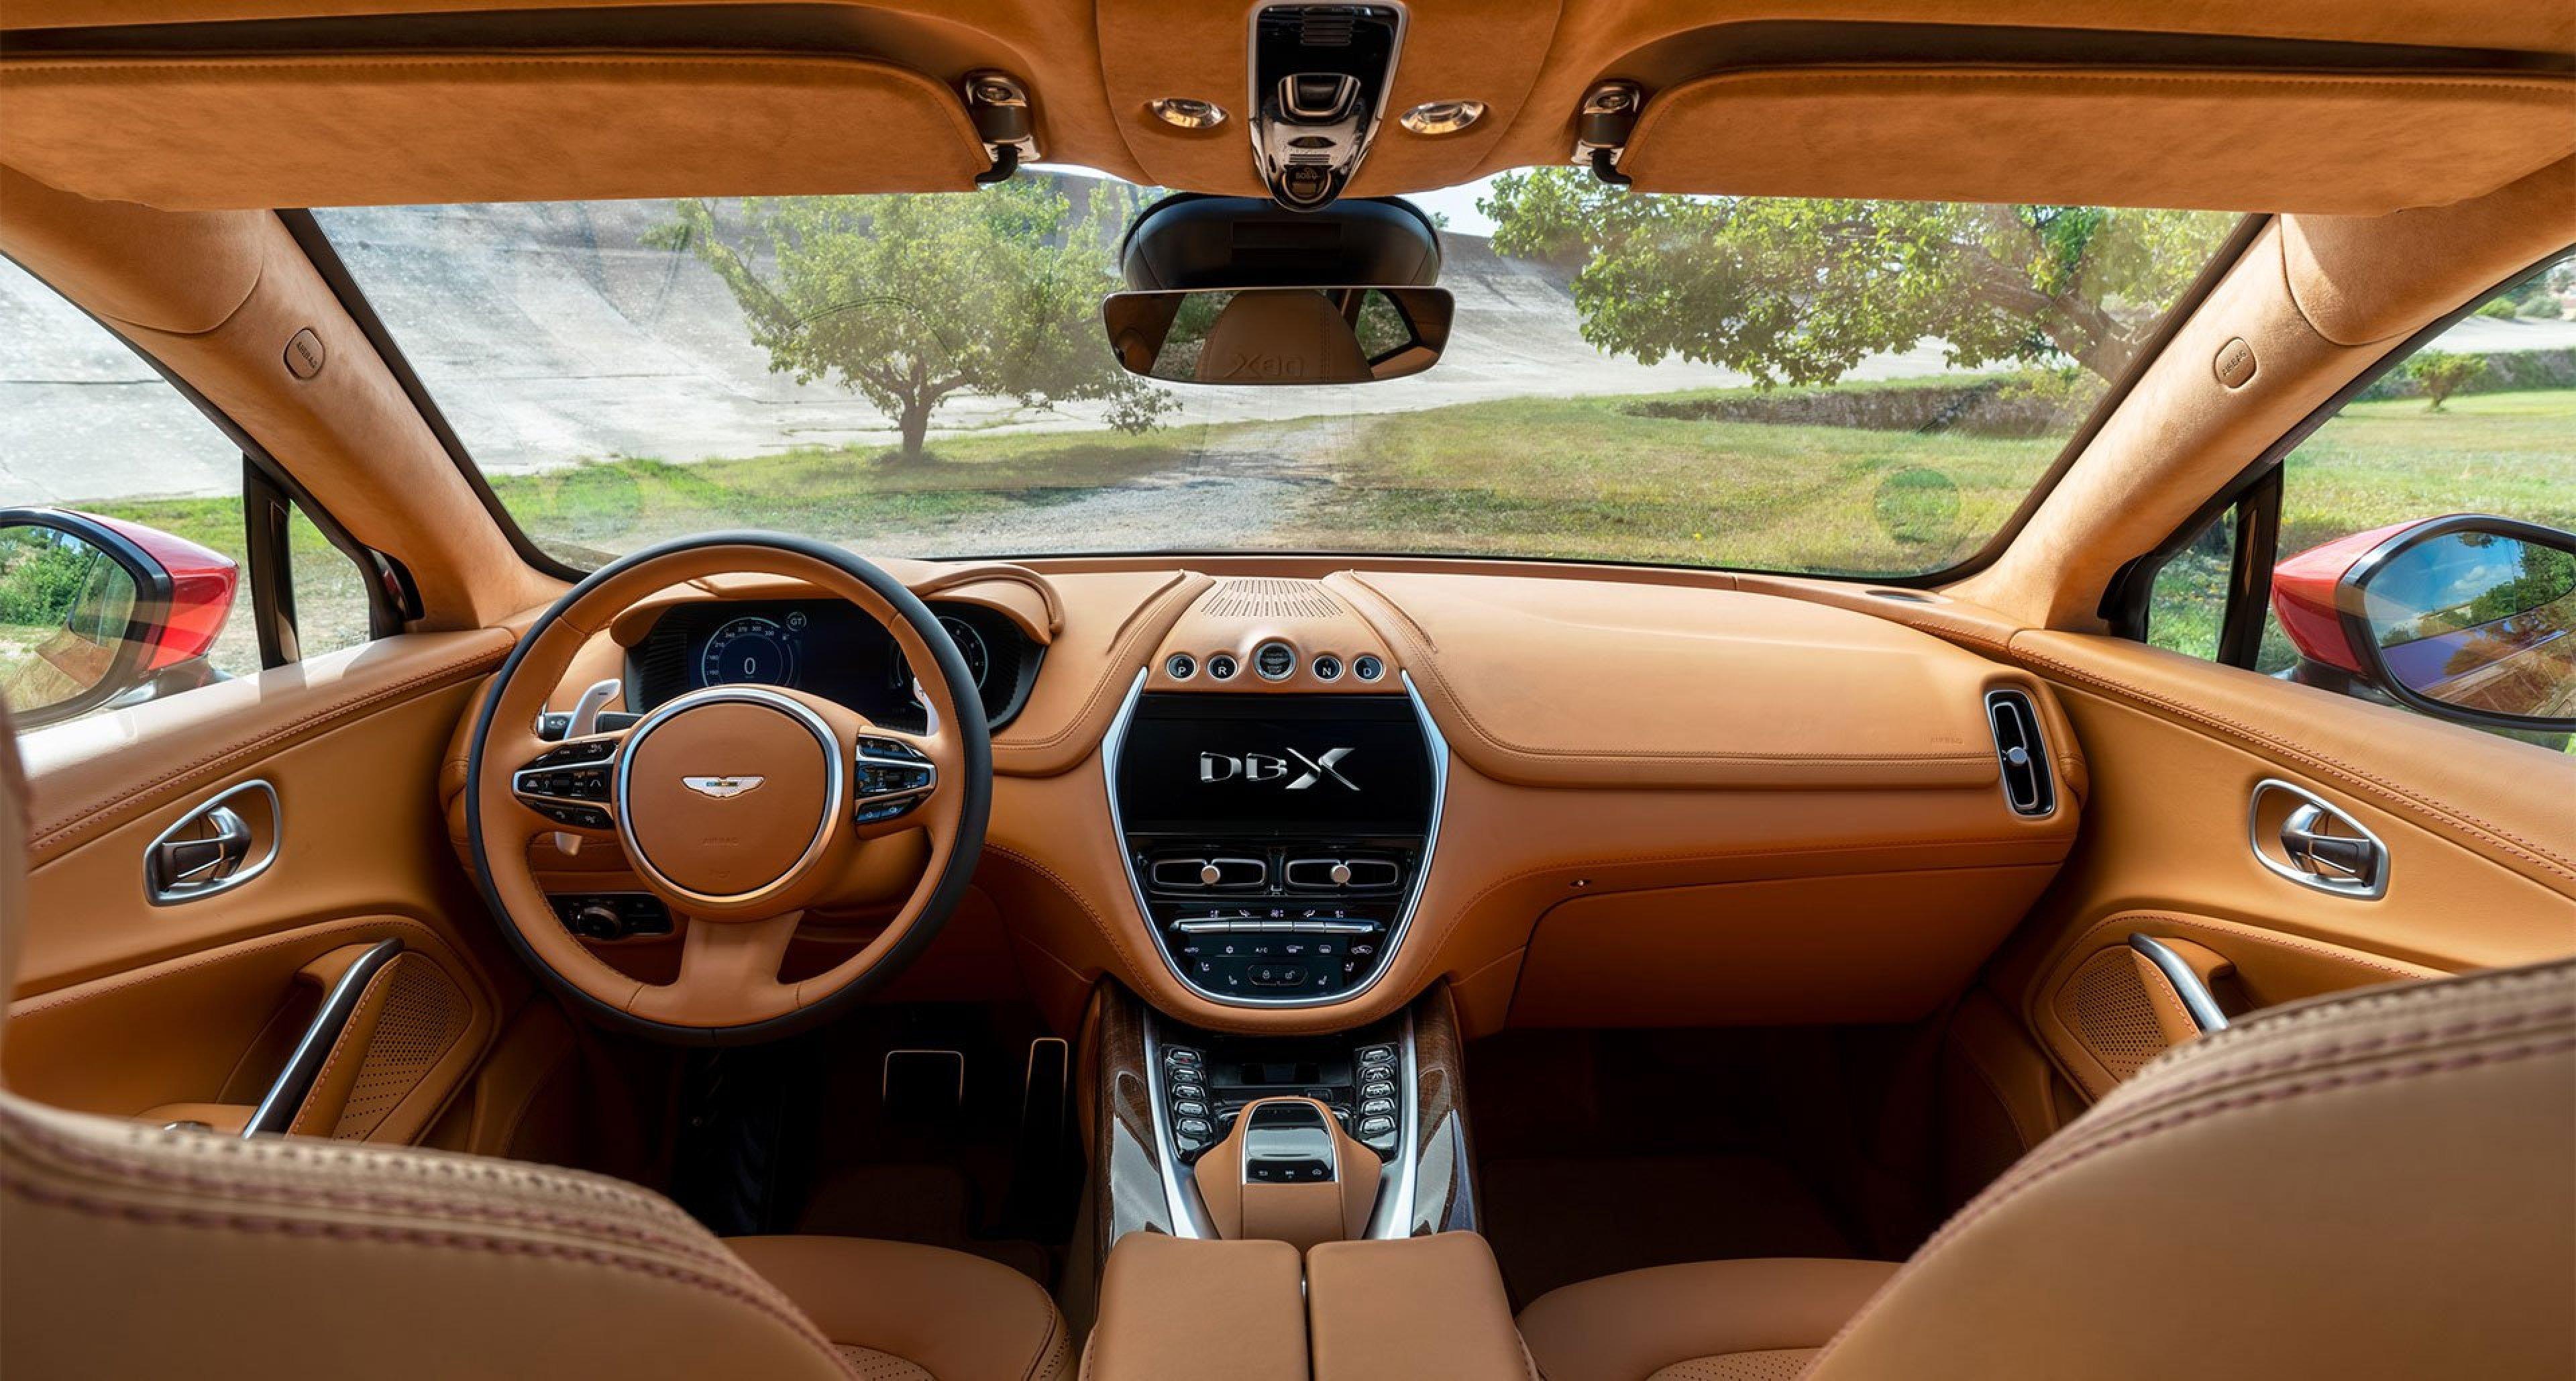 What Do You Make Of The New Aston Martin Dbx Suv Classic Driver Magazine